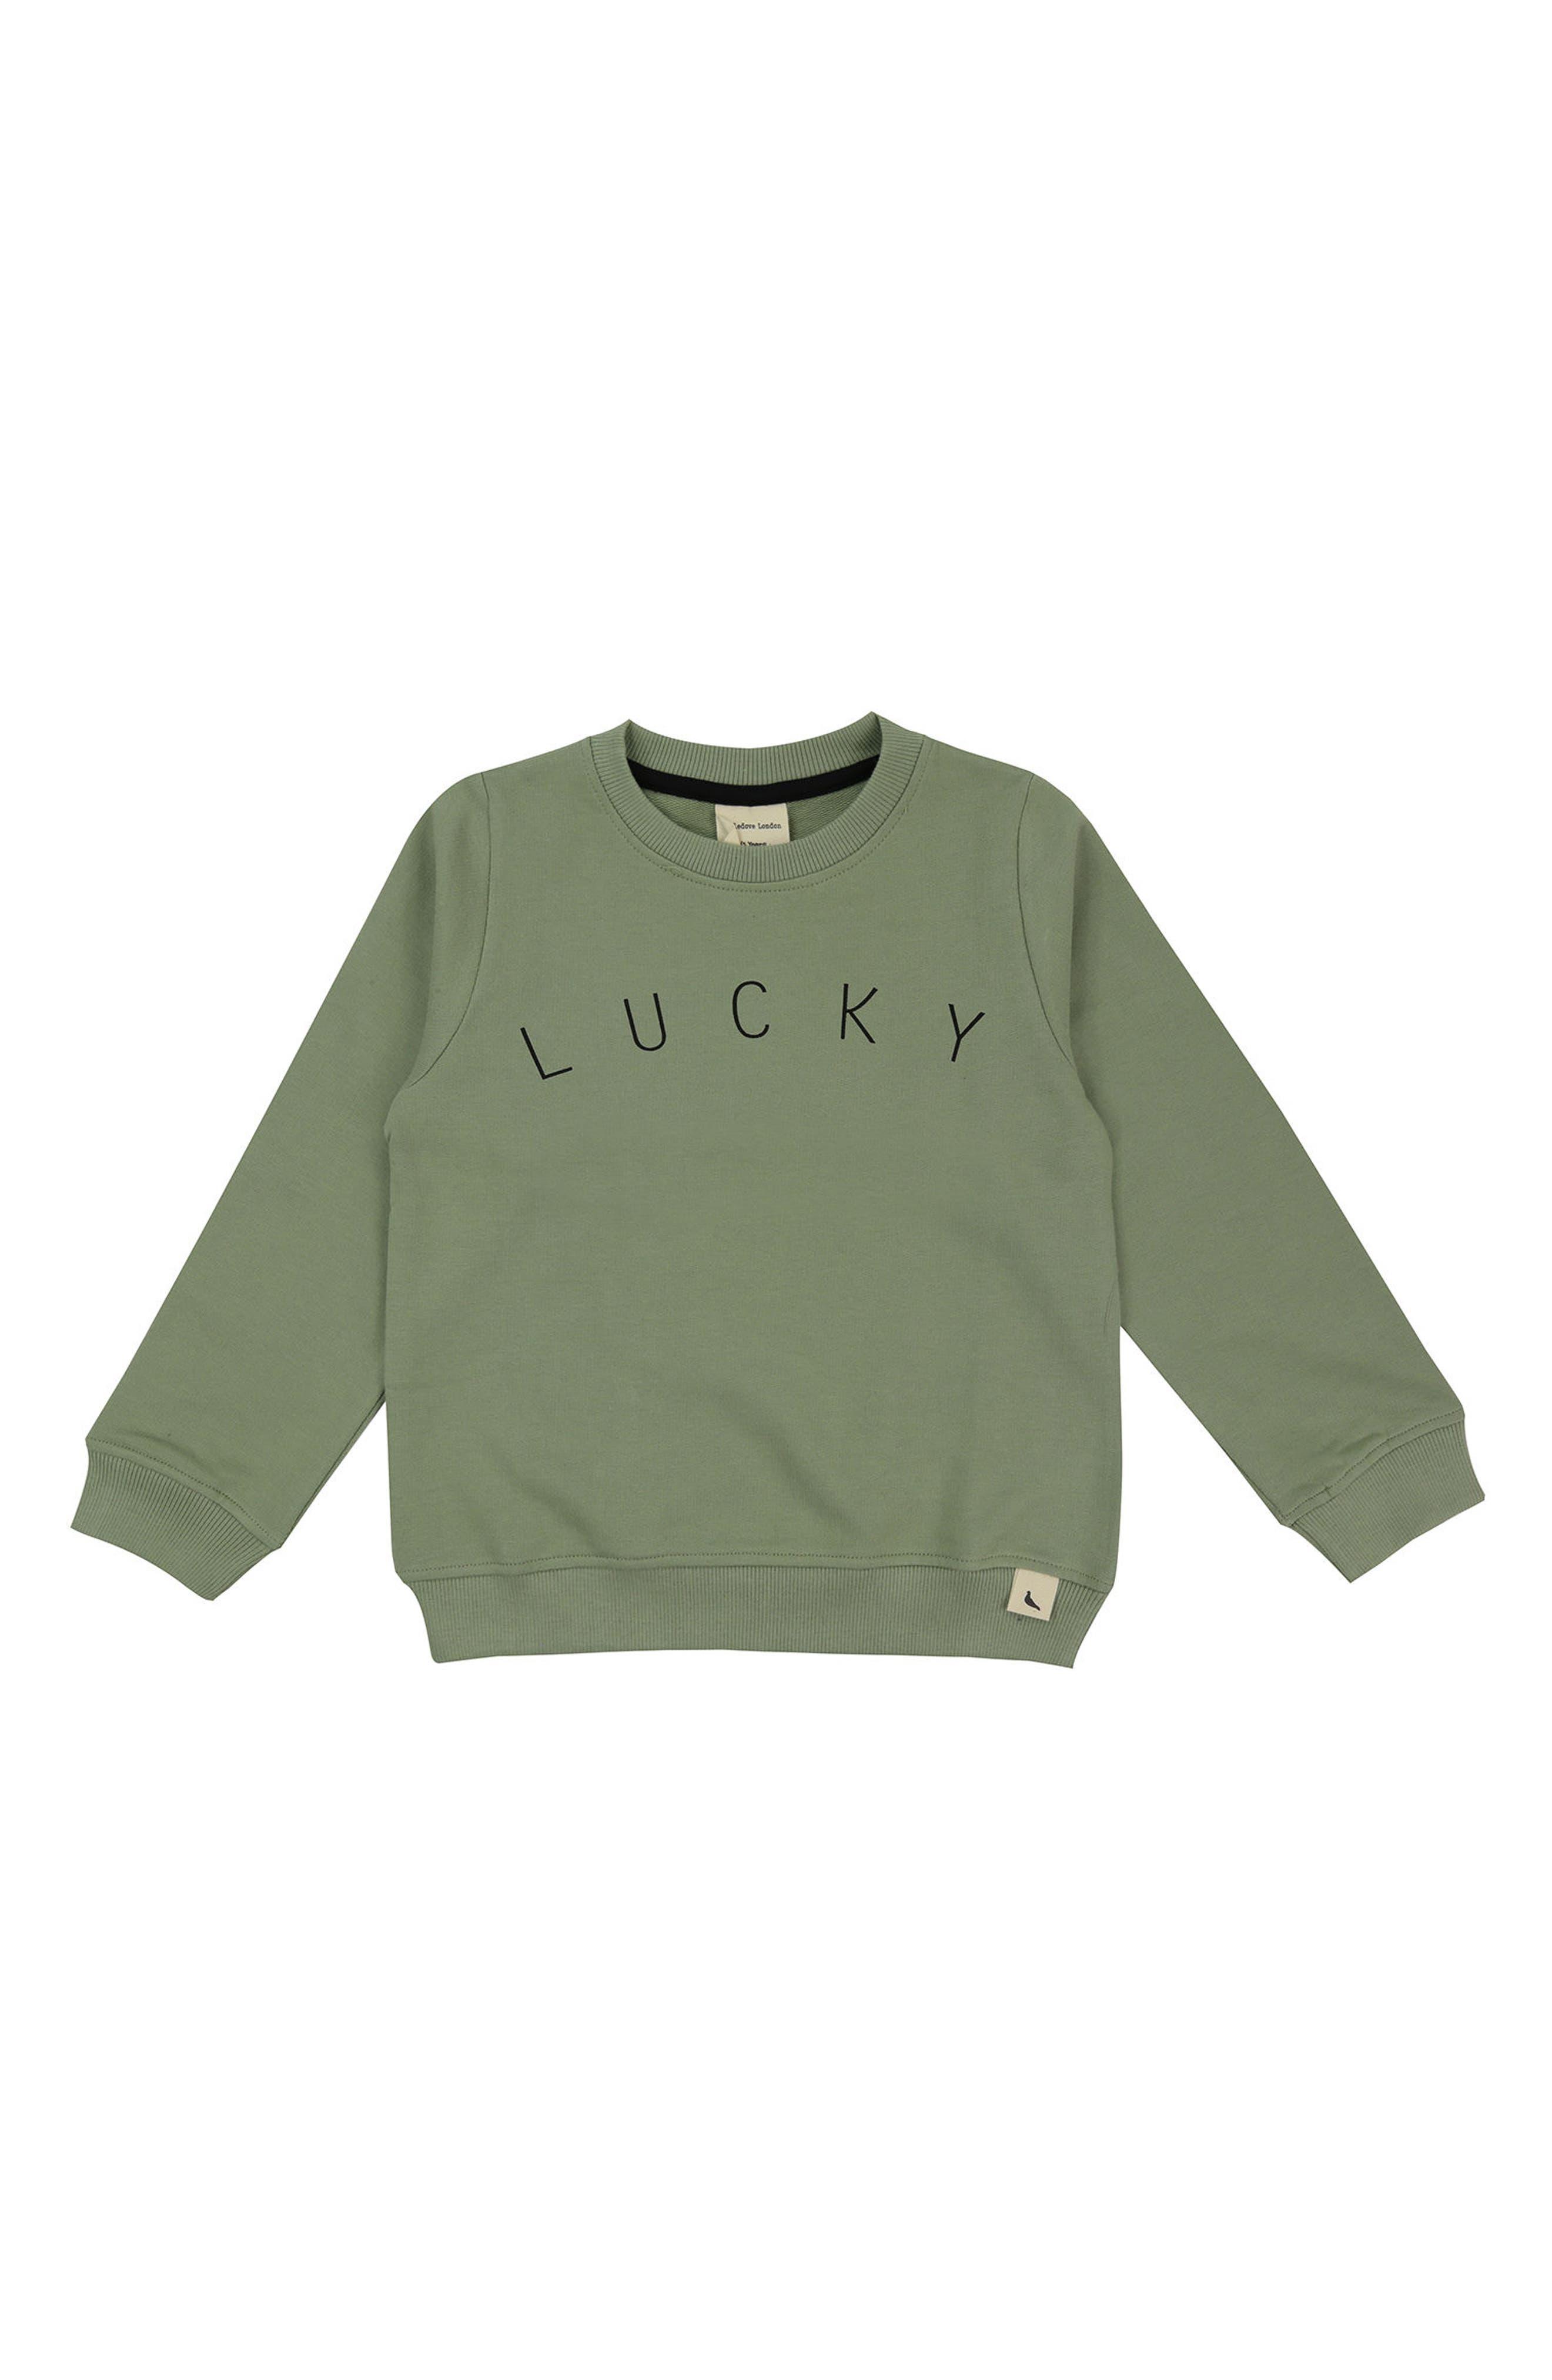 Lucky Sweatshirt,                         Main,                         color, 300